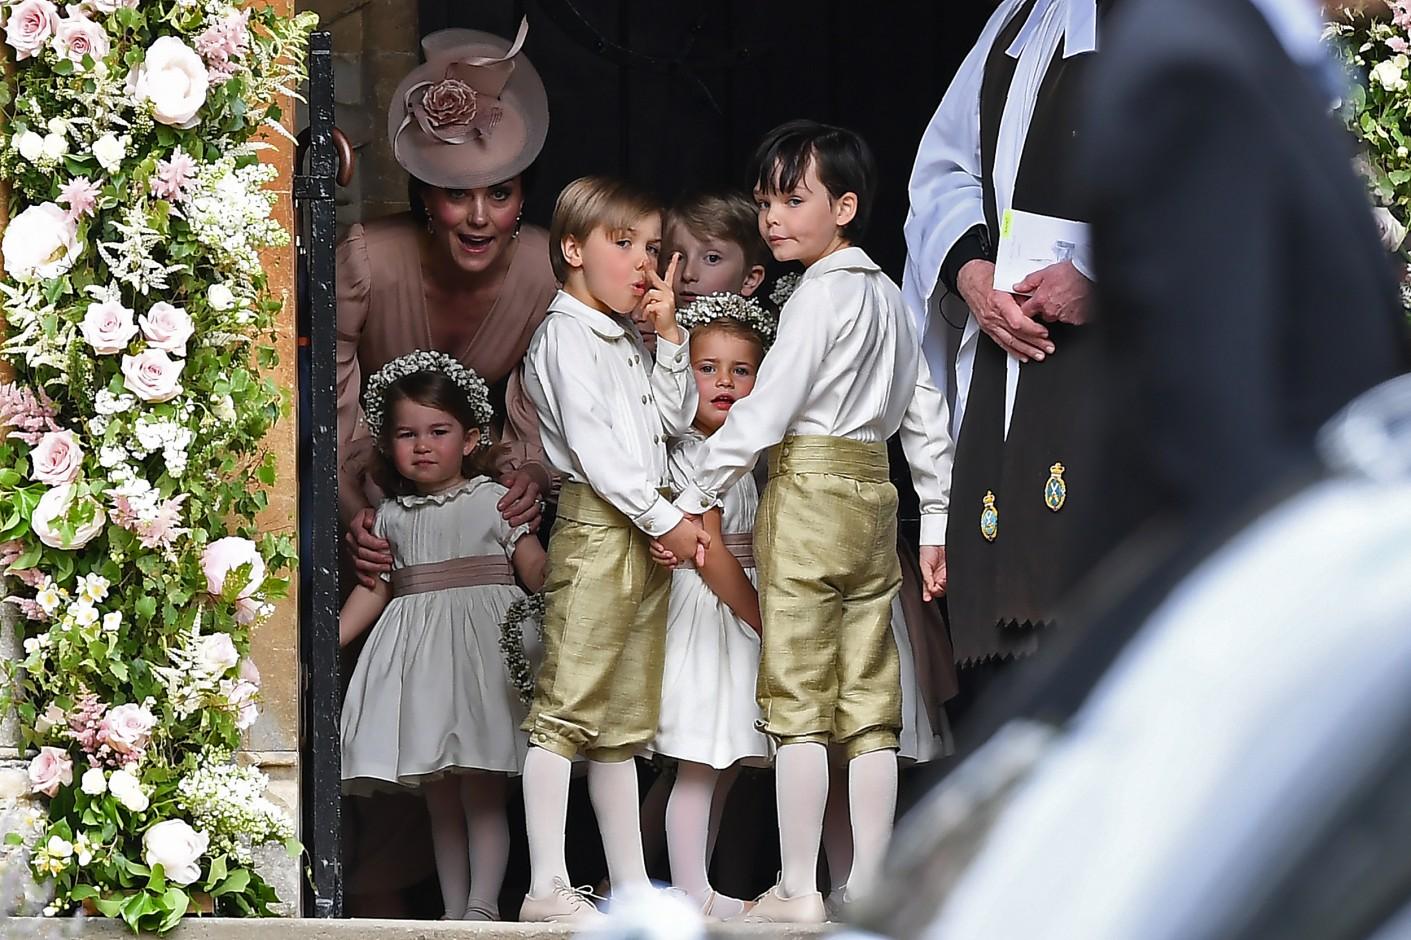 Pippa S Wedding.Photos Of Pippa Middleton S Wedding And Wedding Dress Coveteur